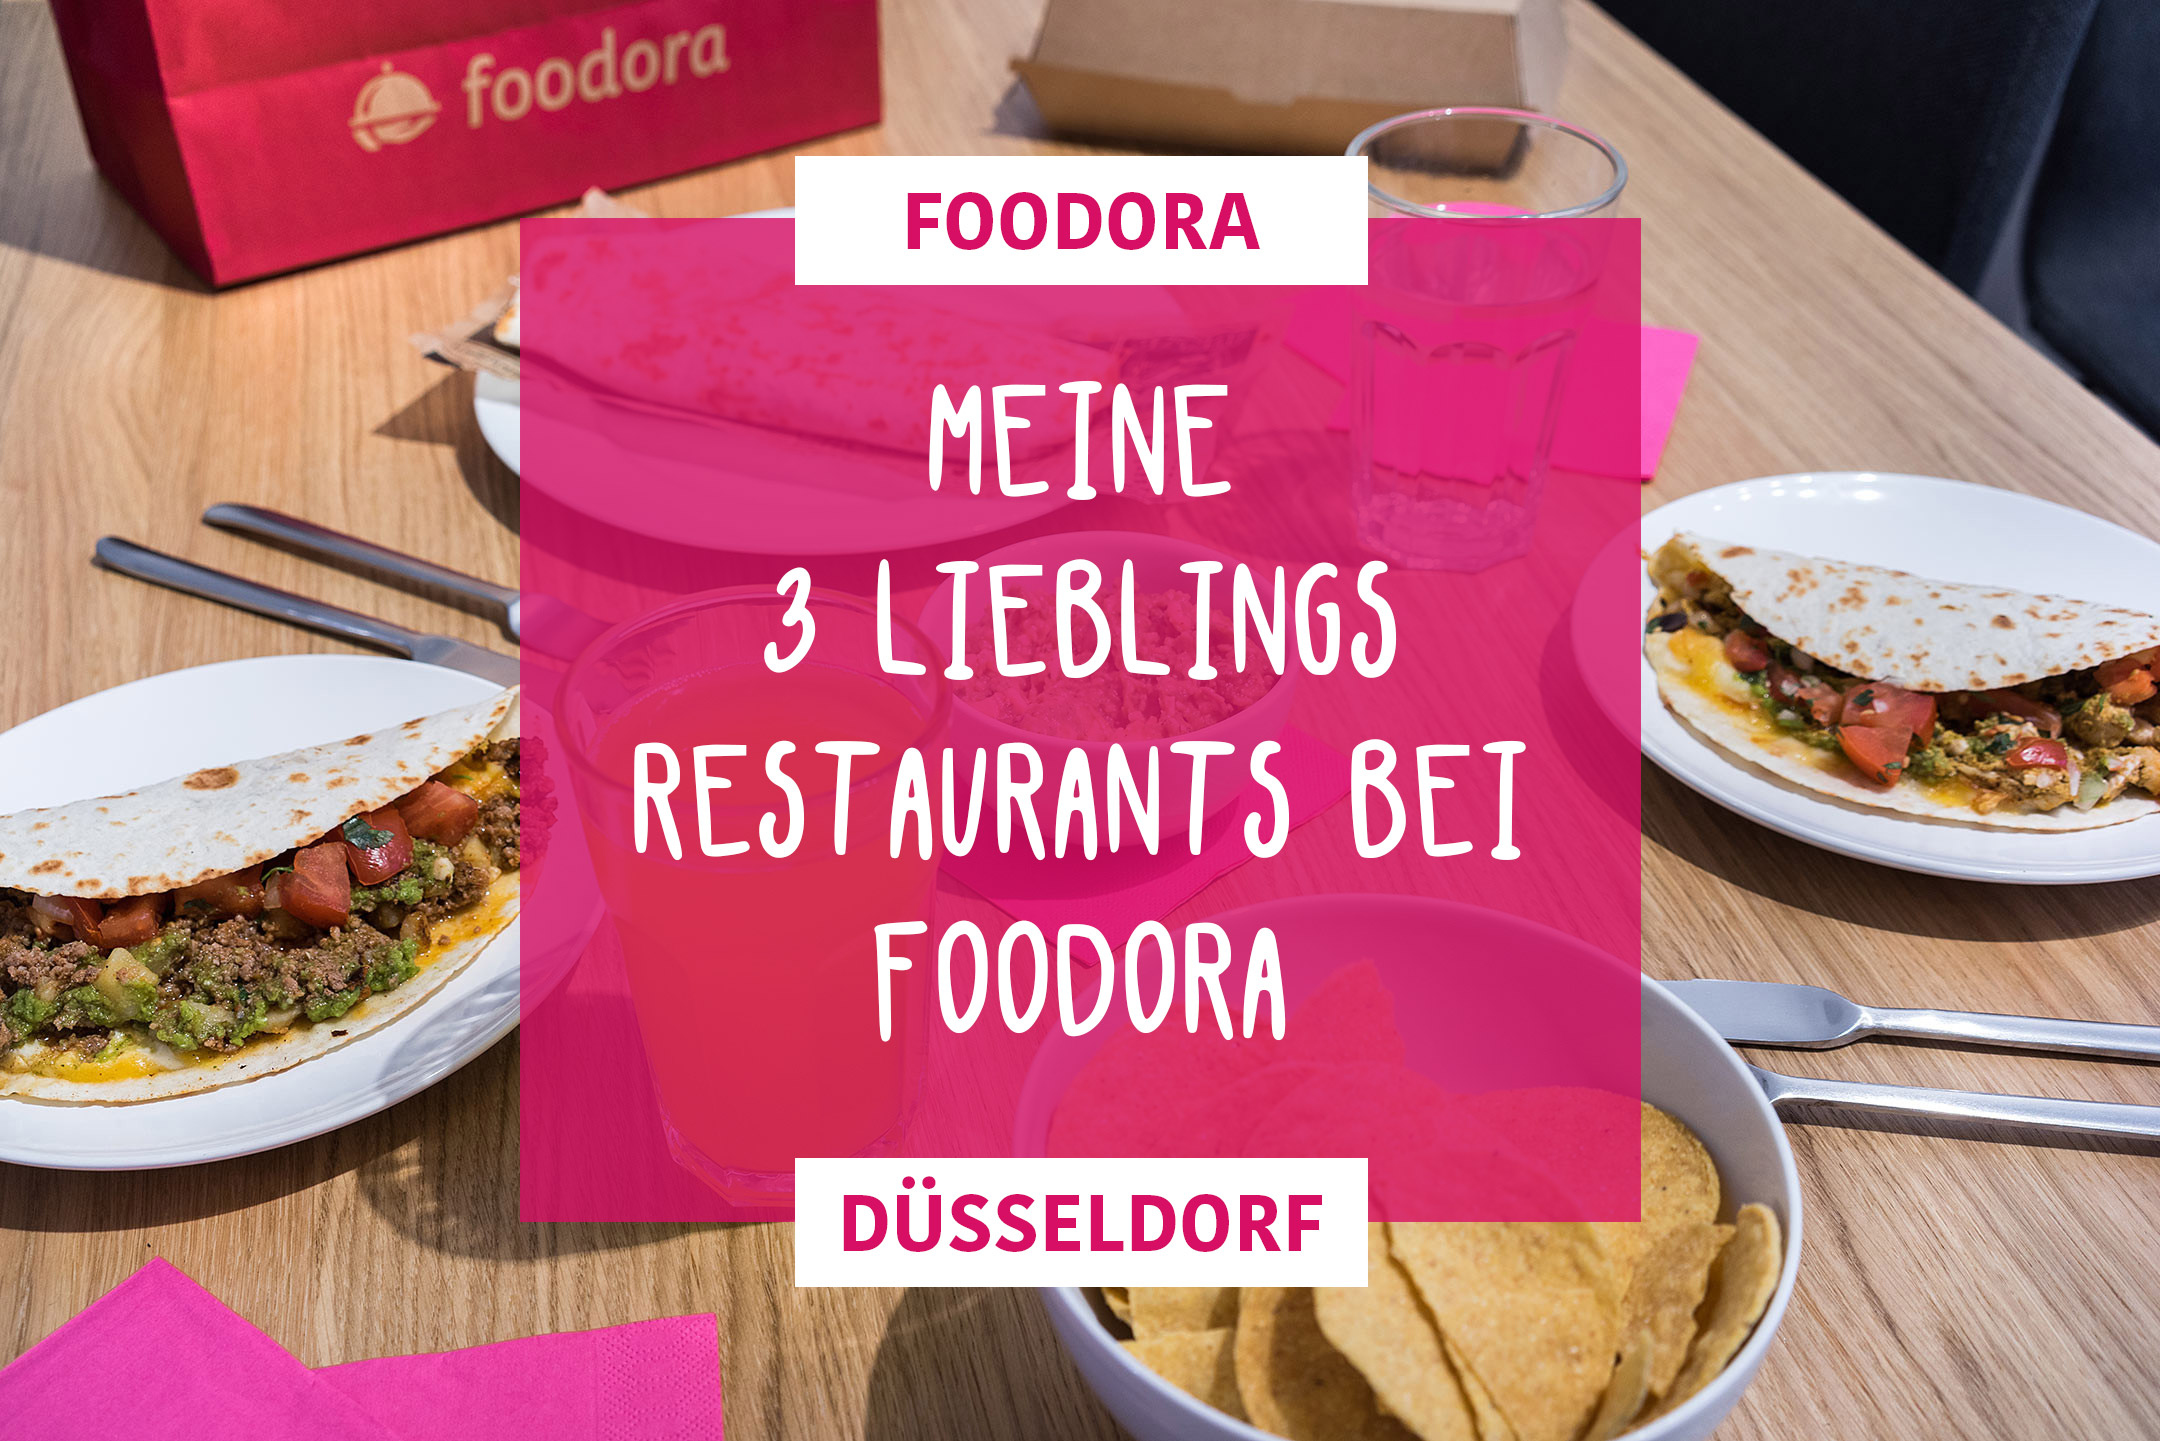 Foodora in Düsseldorf Casita Mexicana Essen Lifestyle Blog Sunnyinga